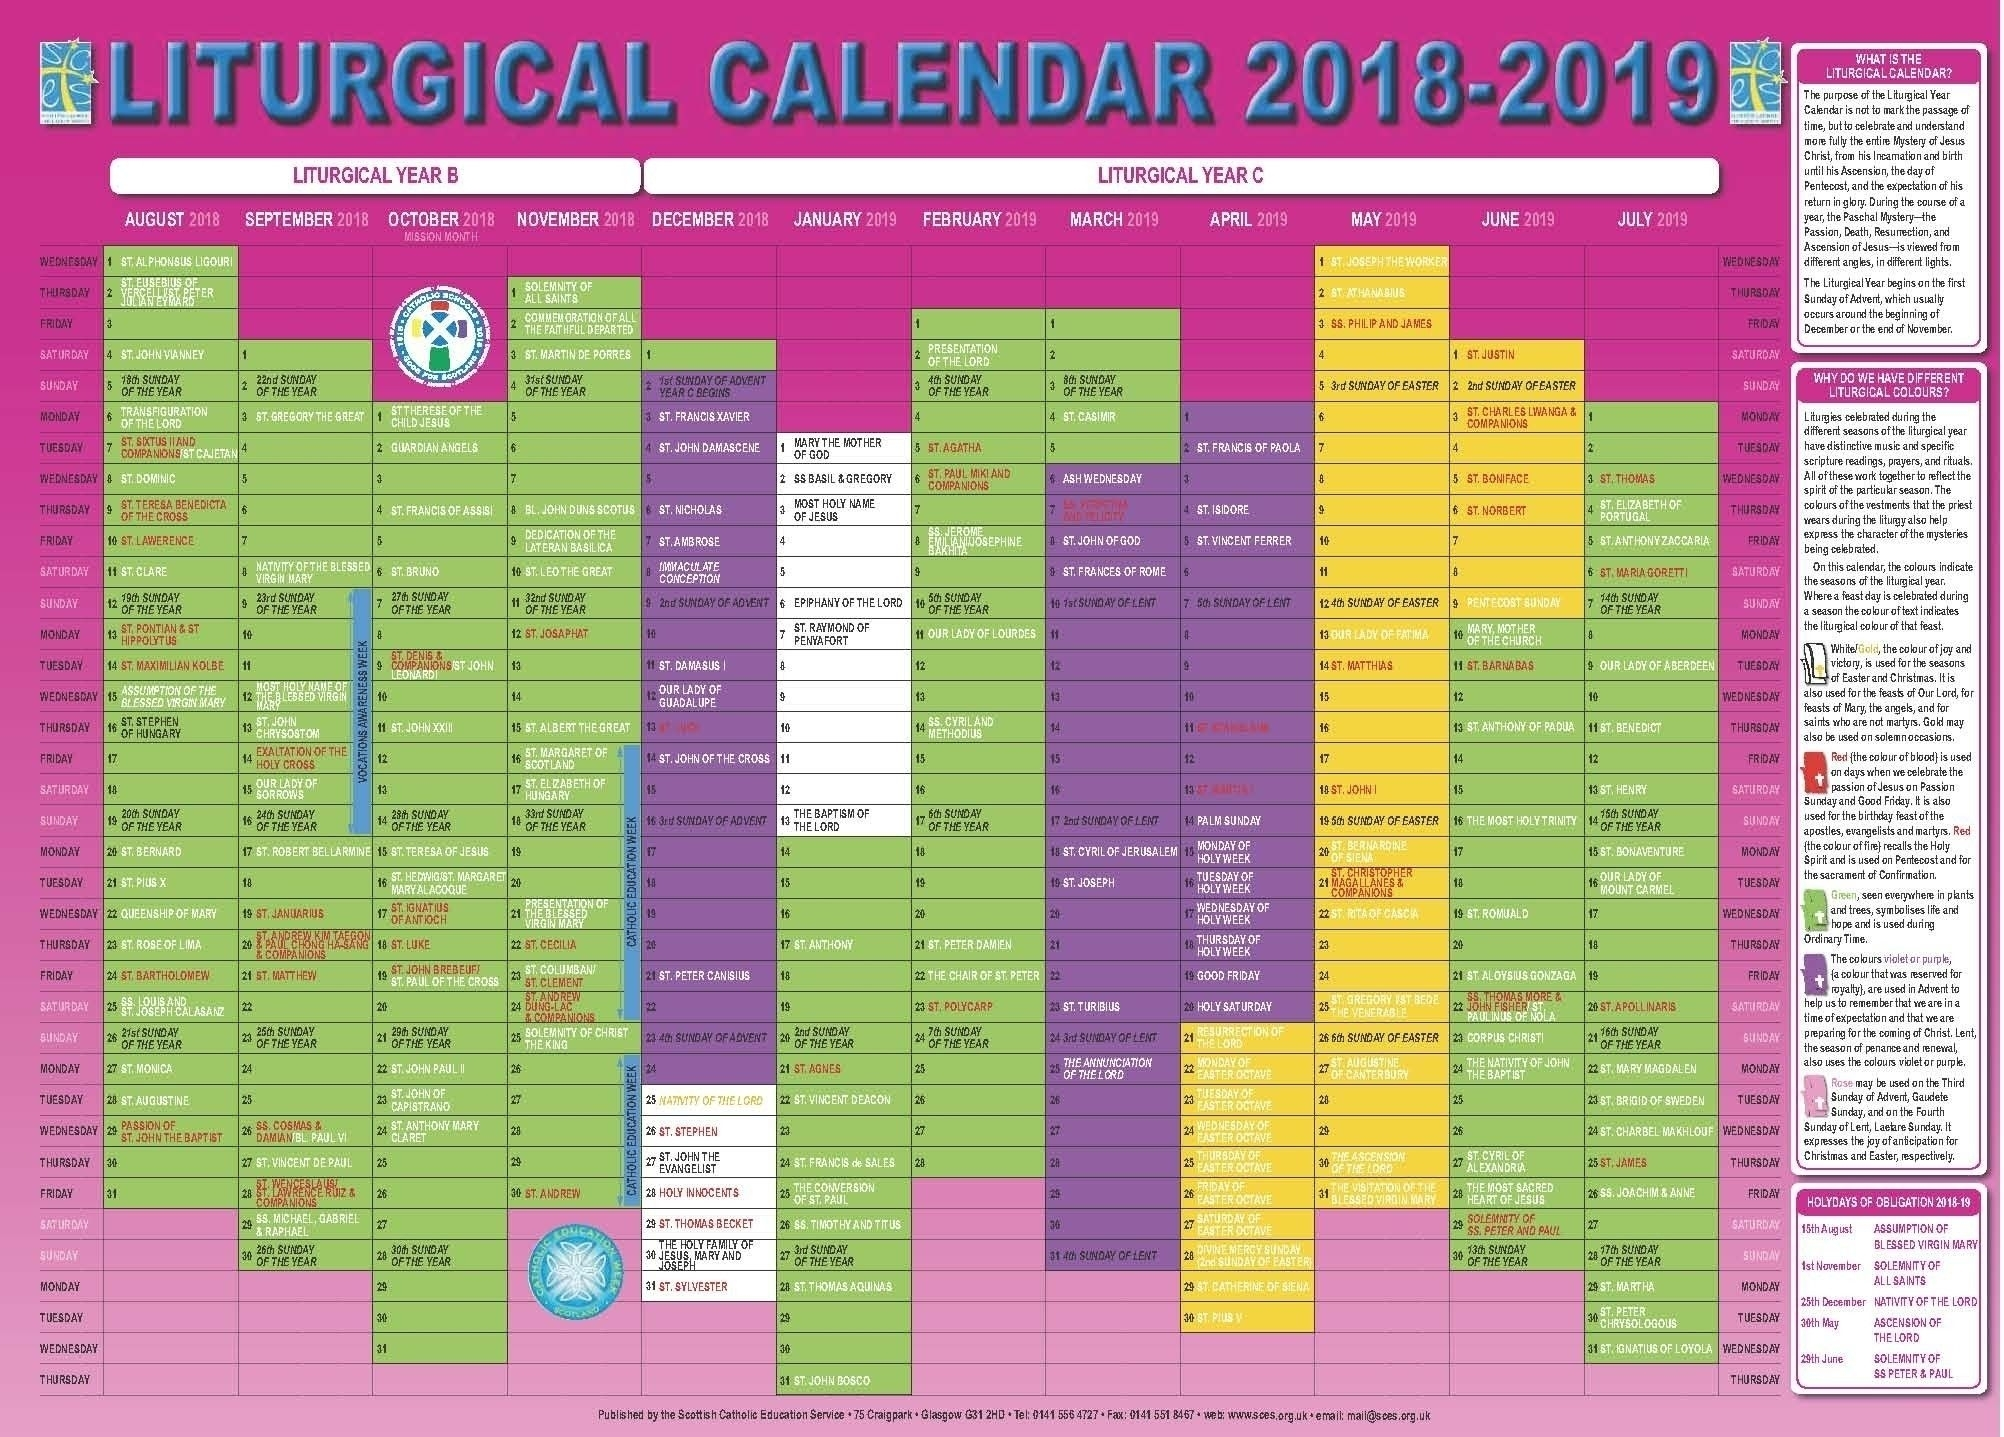 Free Printable Liturgical Calendar In 2020 | Catholic